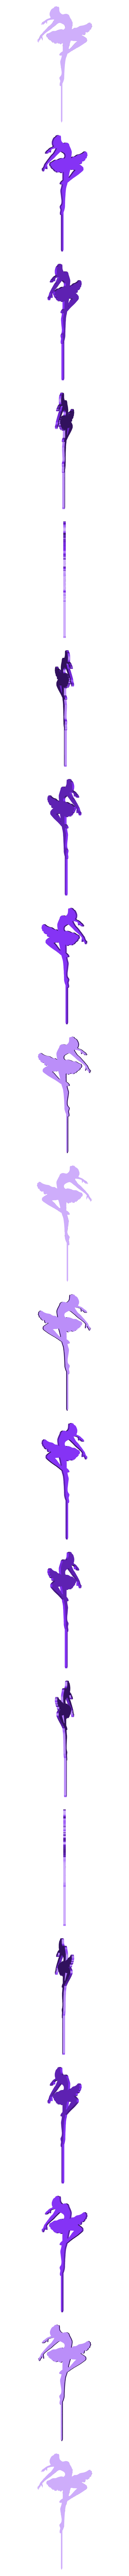 bailarina pose cupcake.stl Download STL file Topper ballet dancer cupcake • 3D printer template, Geralp